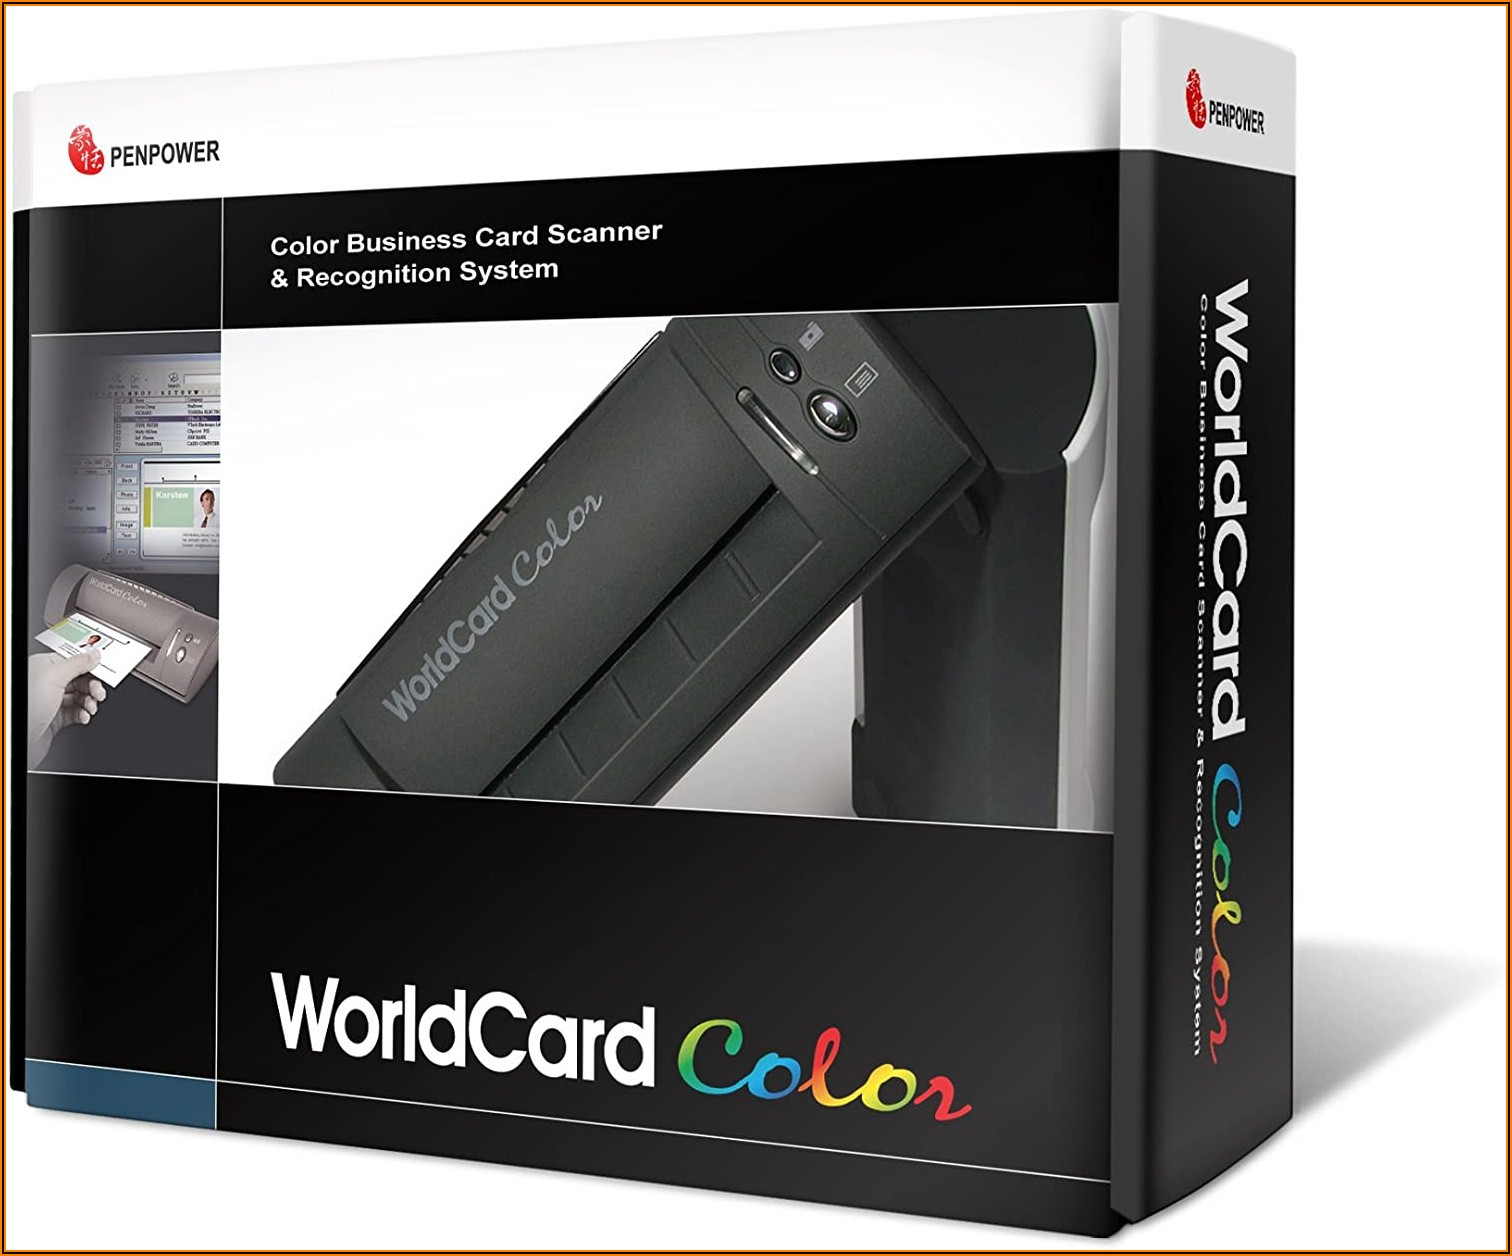 Penpower Worldcard Color Business Card Scanner Manual